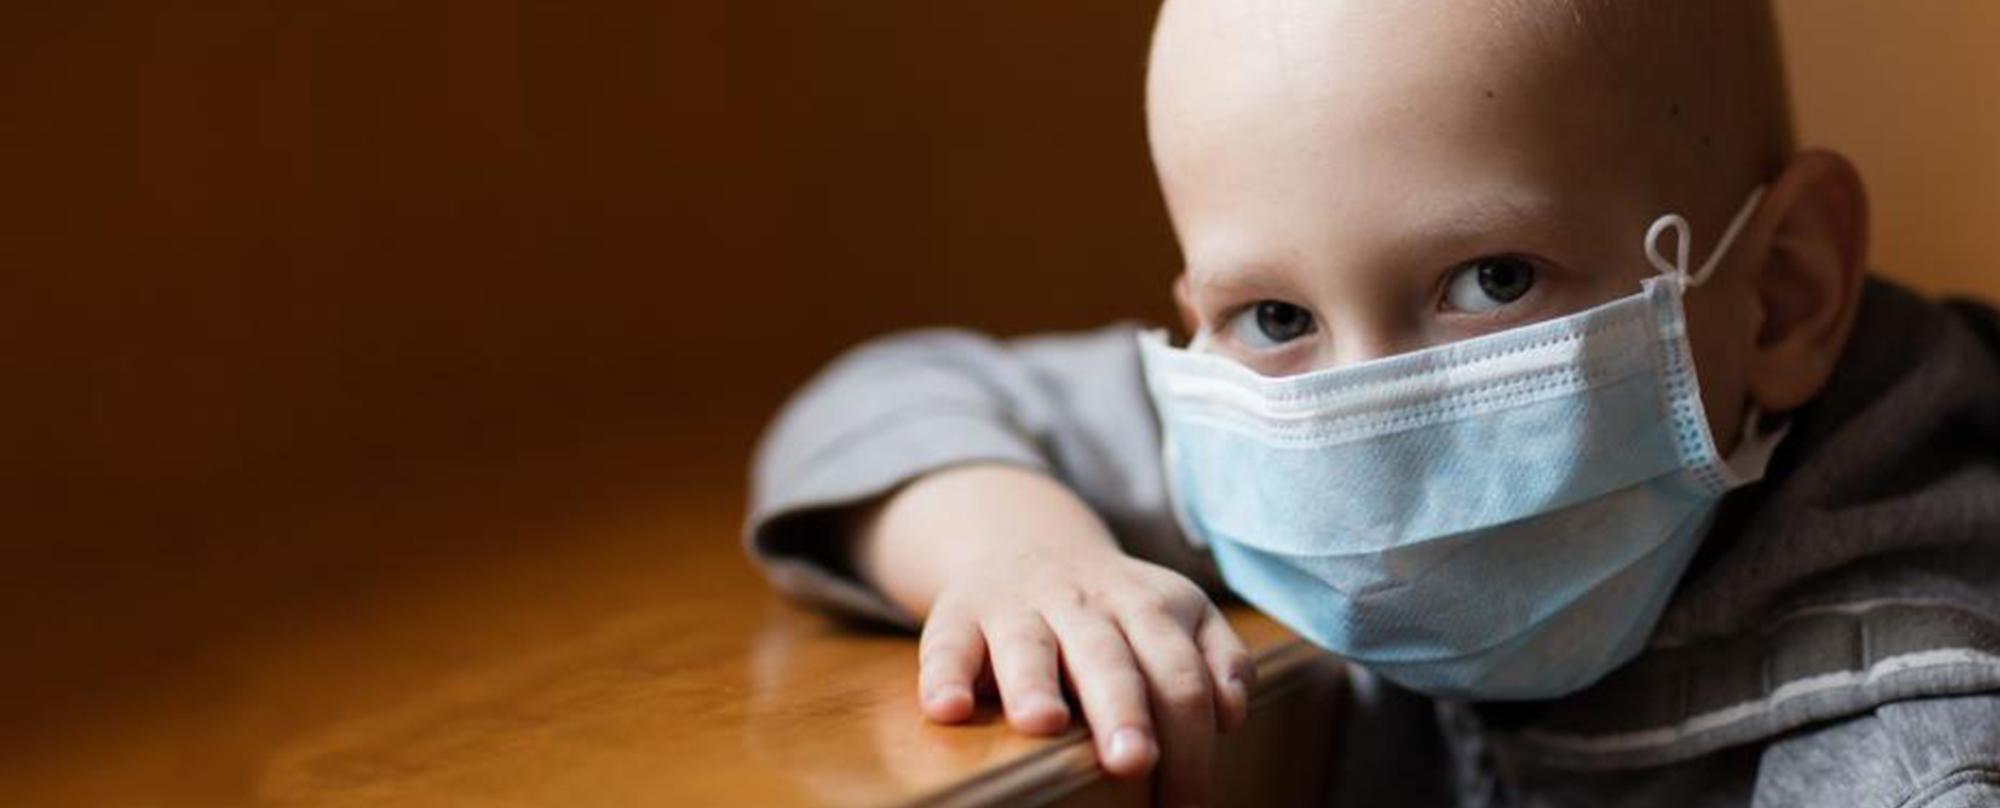 Medikamente für Tschernobyl-Kinder Projekt